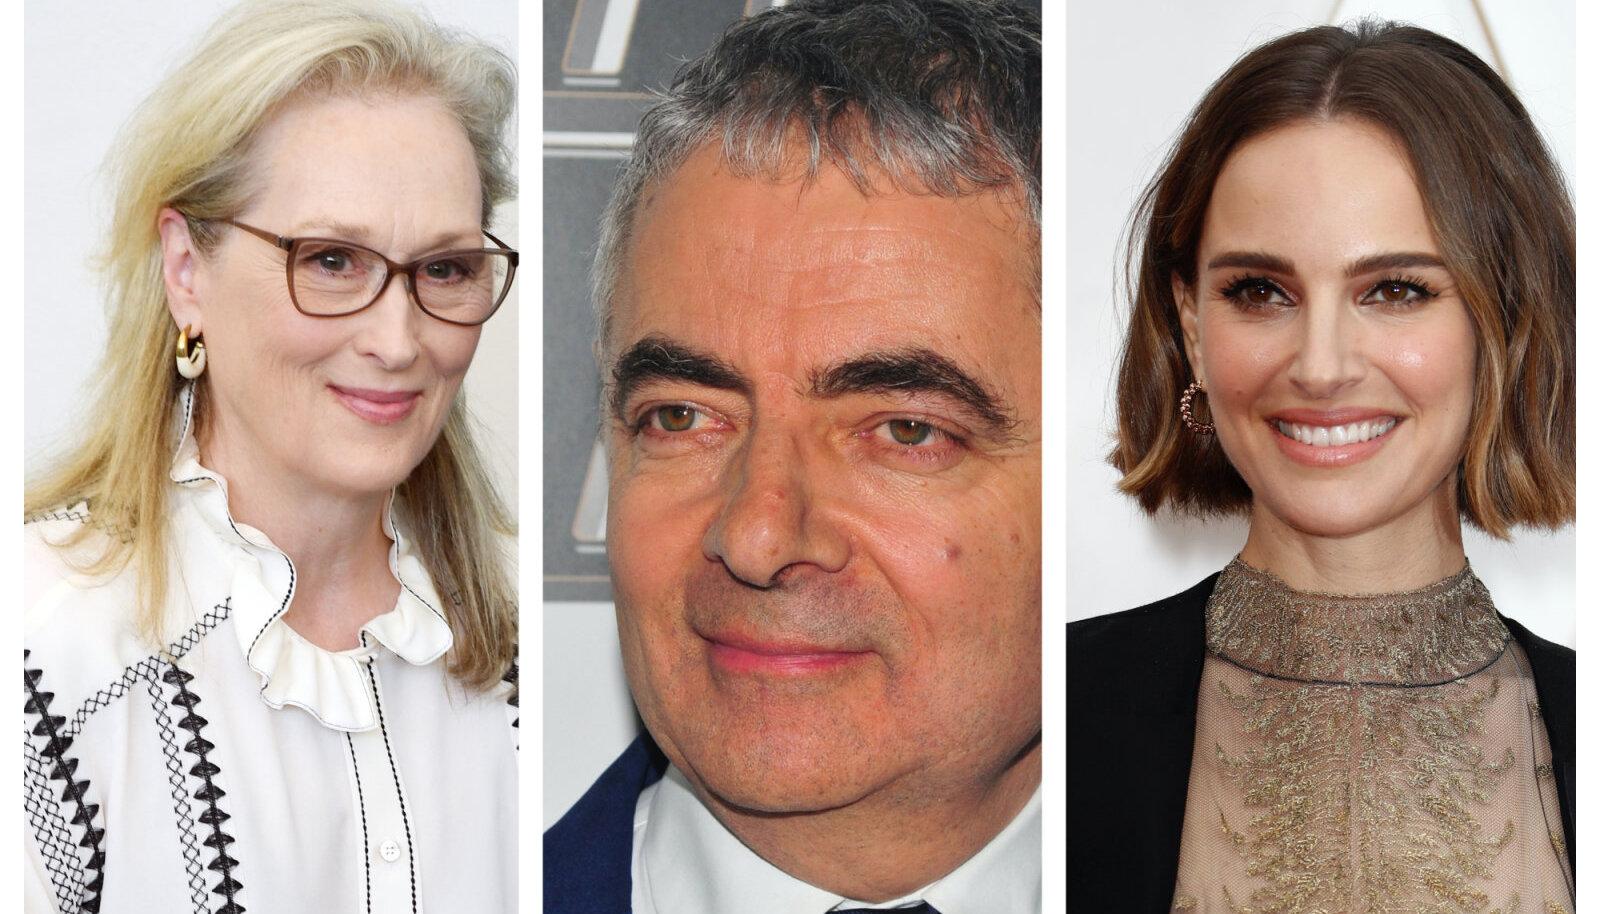 Meryl Streep, Rowan Atkinson, Natalie Portman